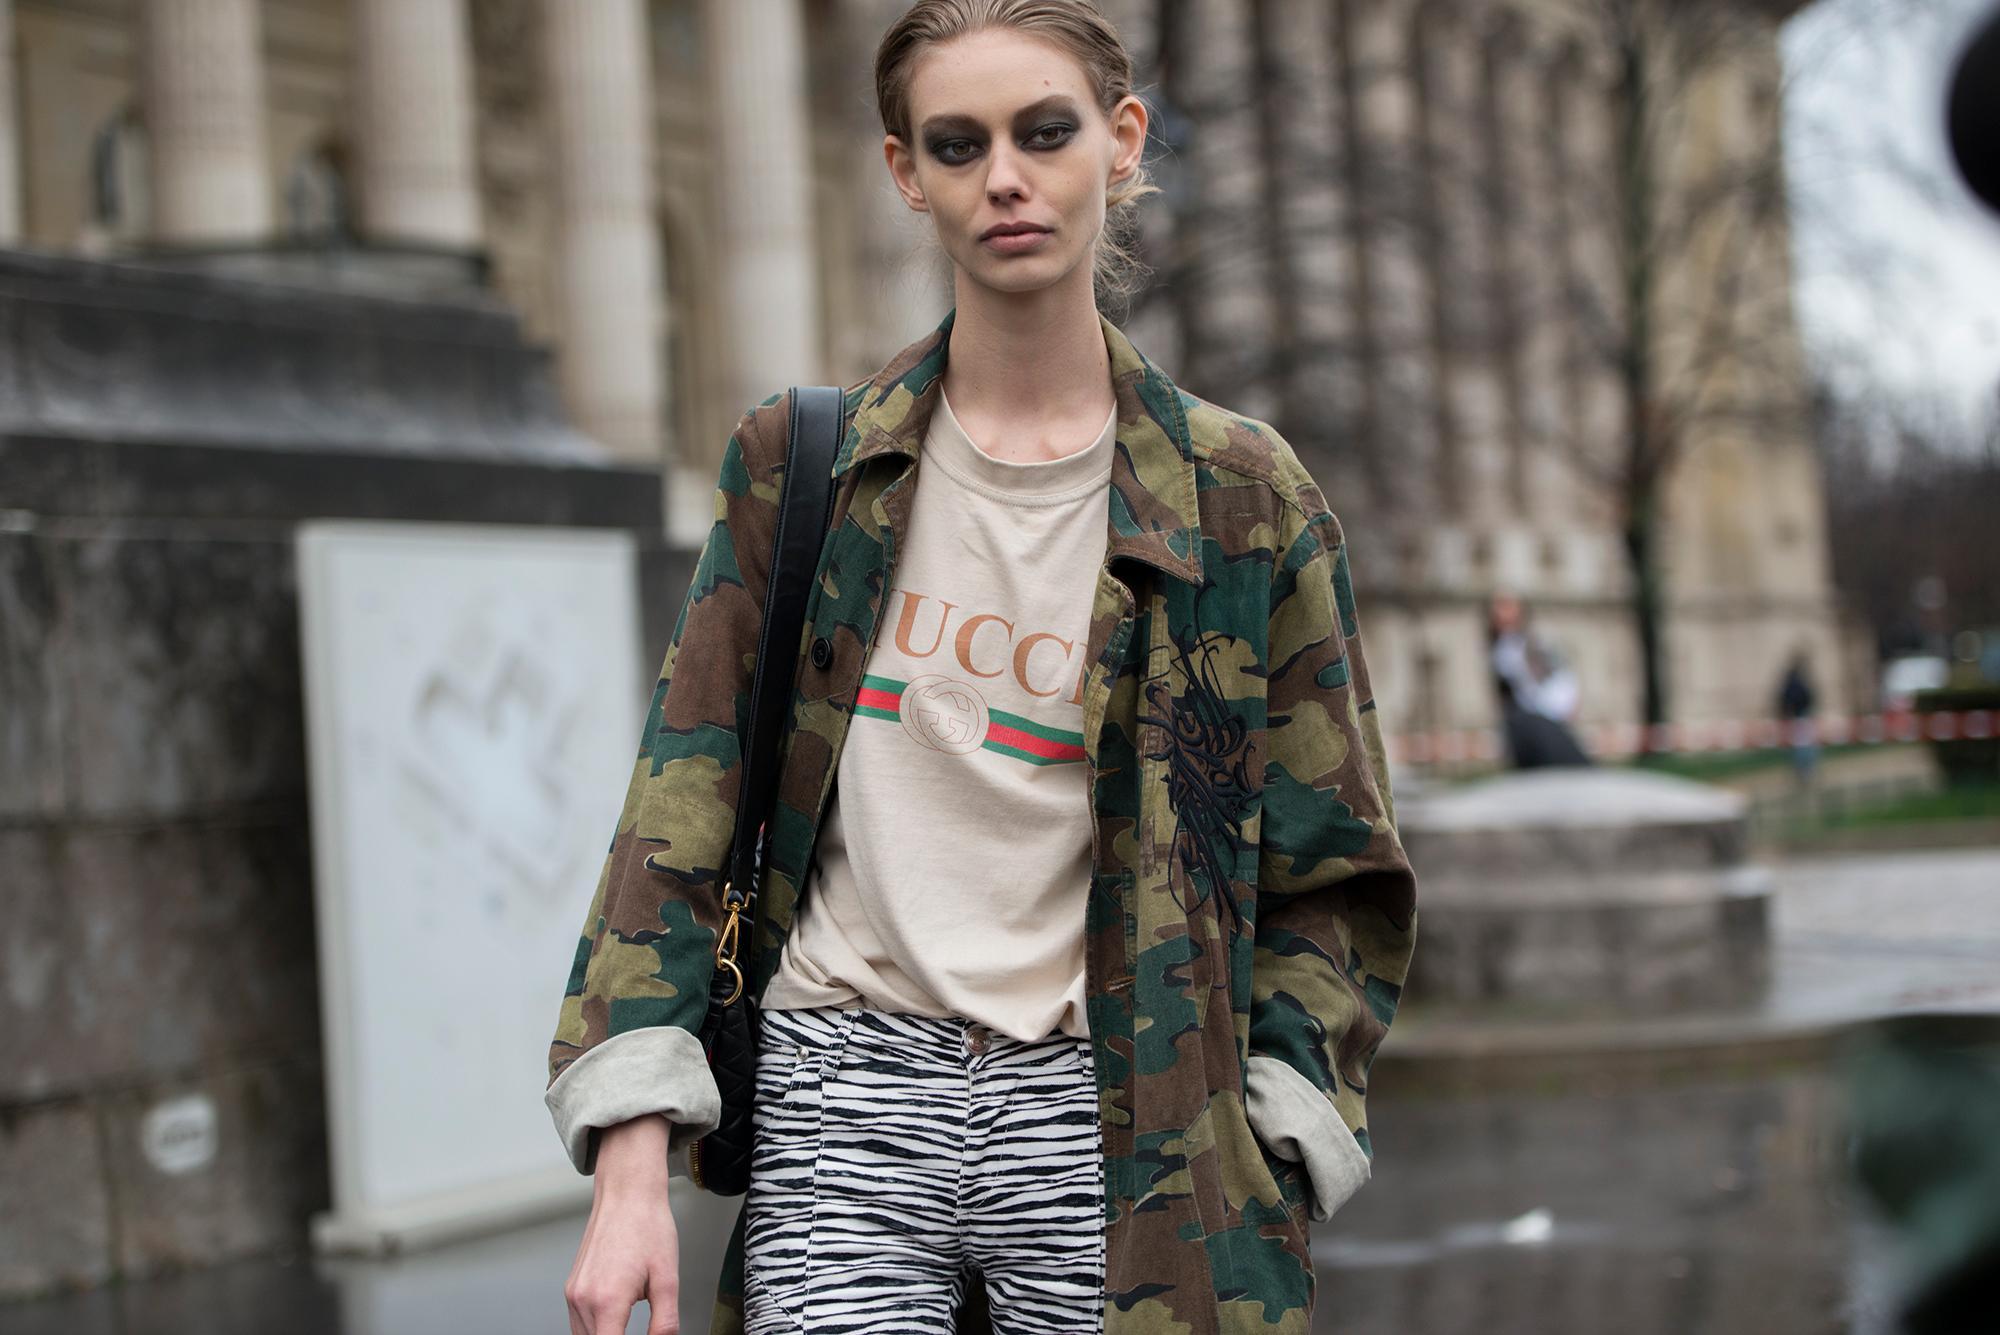 Streetsnaps Paris Fashion Week March 2017 Part 2 - 3747937